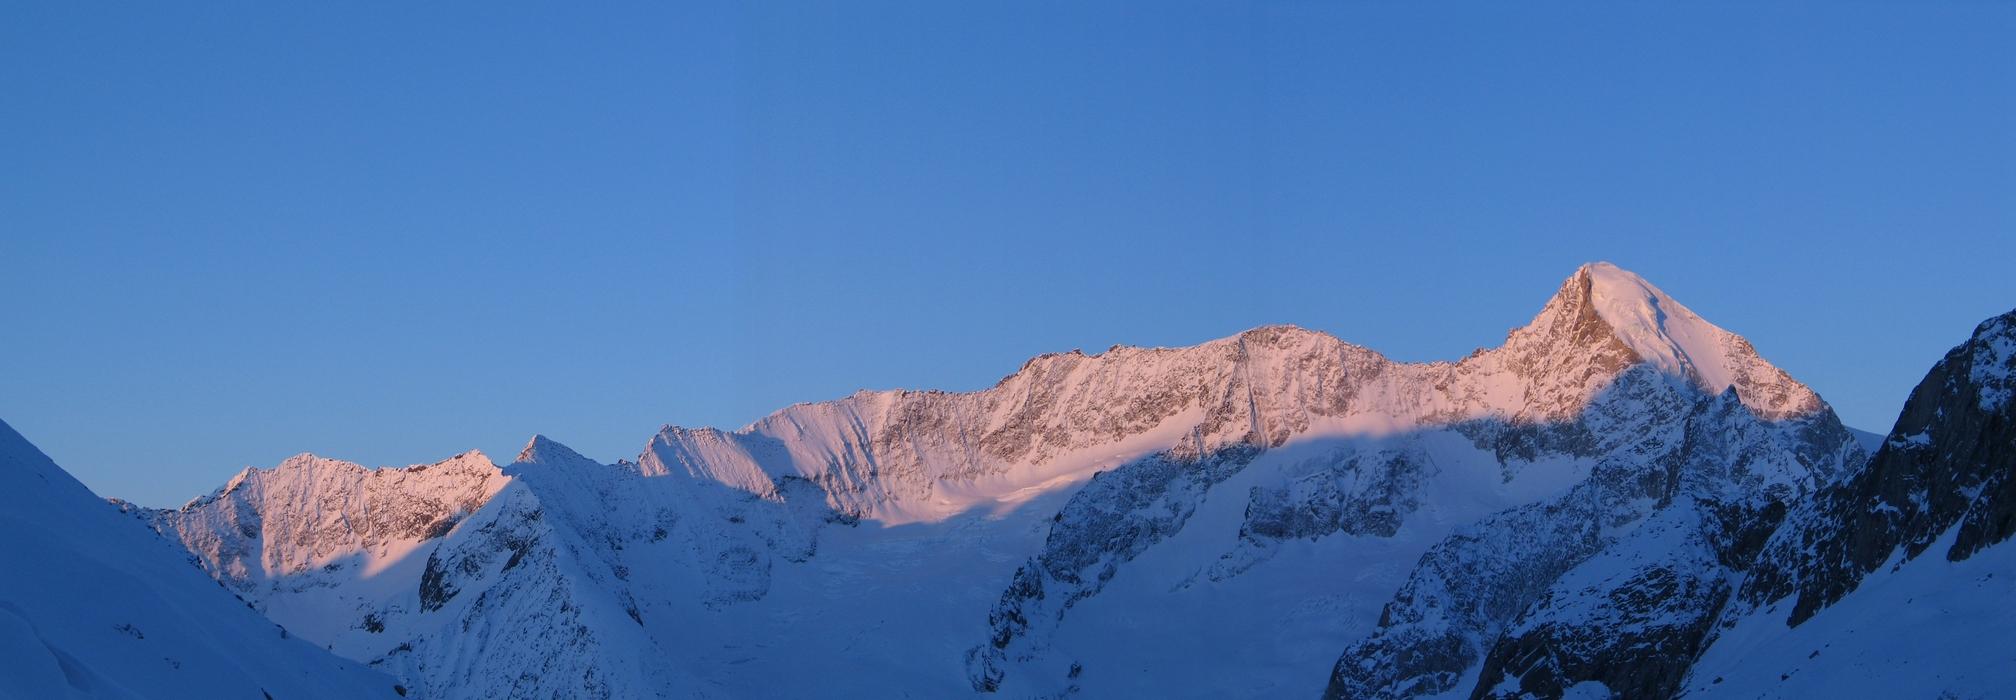 Grosser Aletschhorn Berner Alpen / Alpes bernoises Switzerland panorama 03